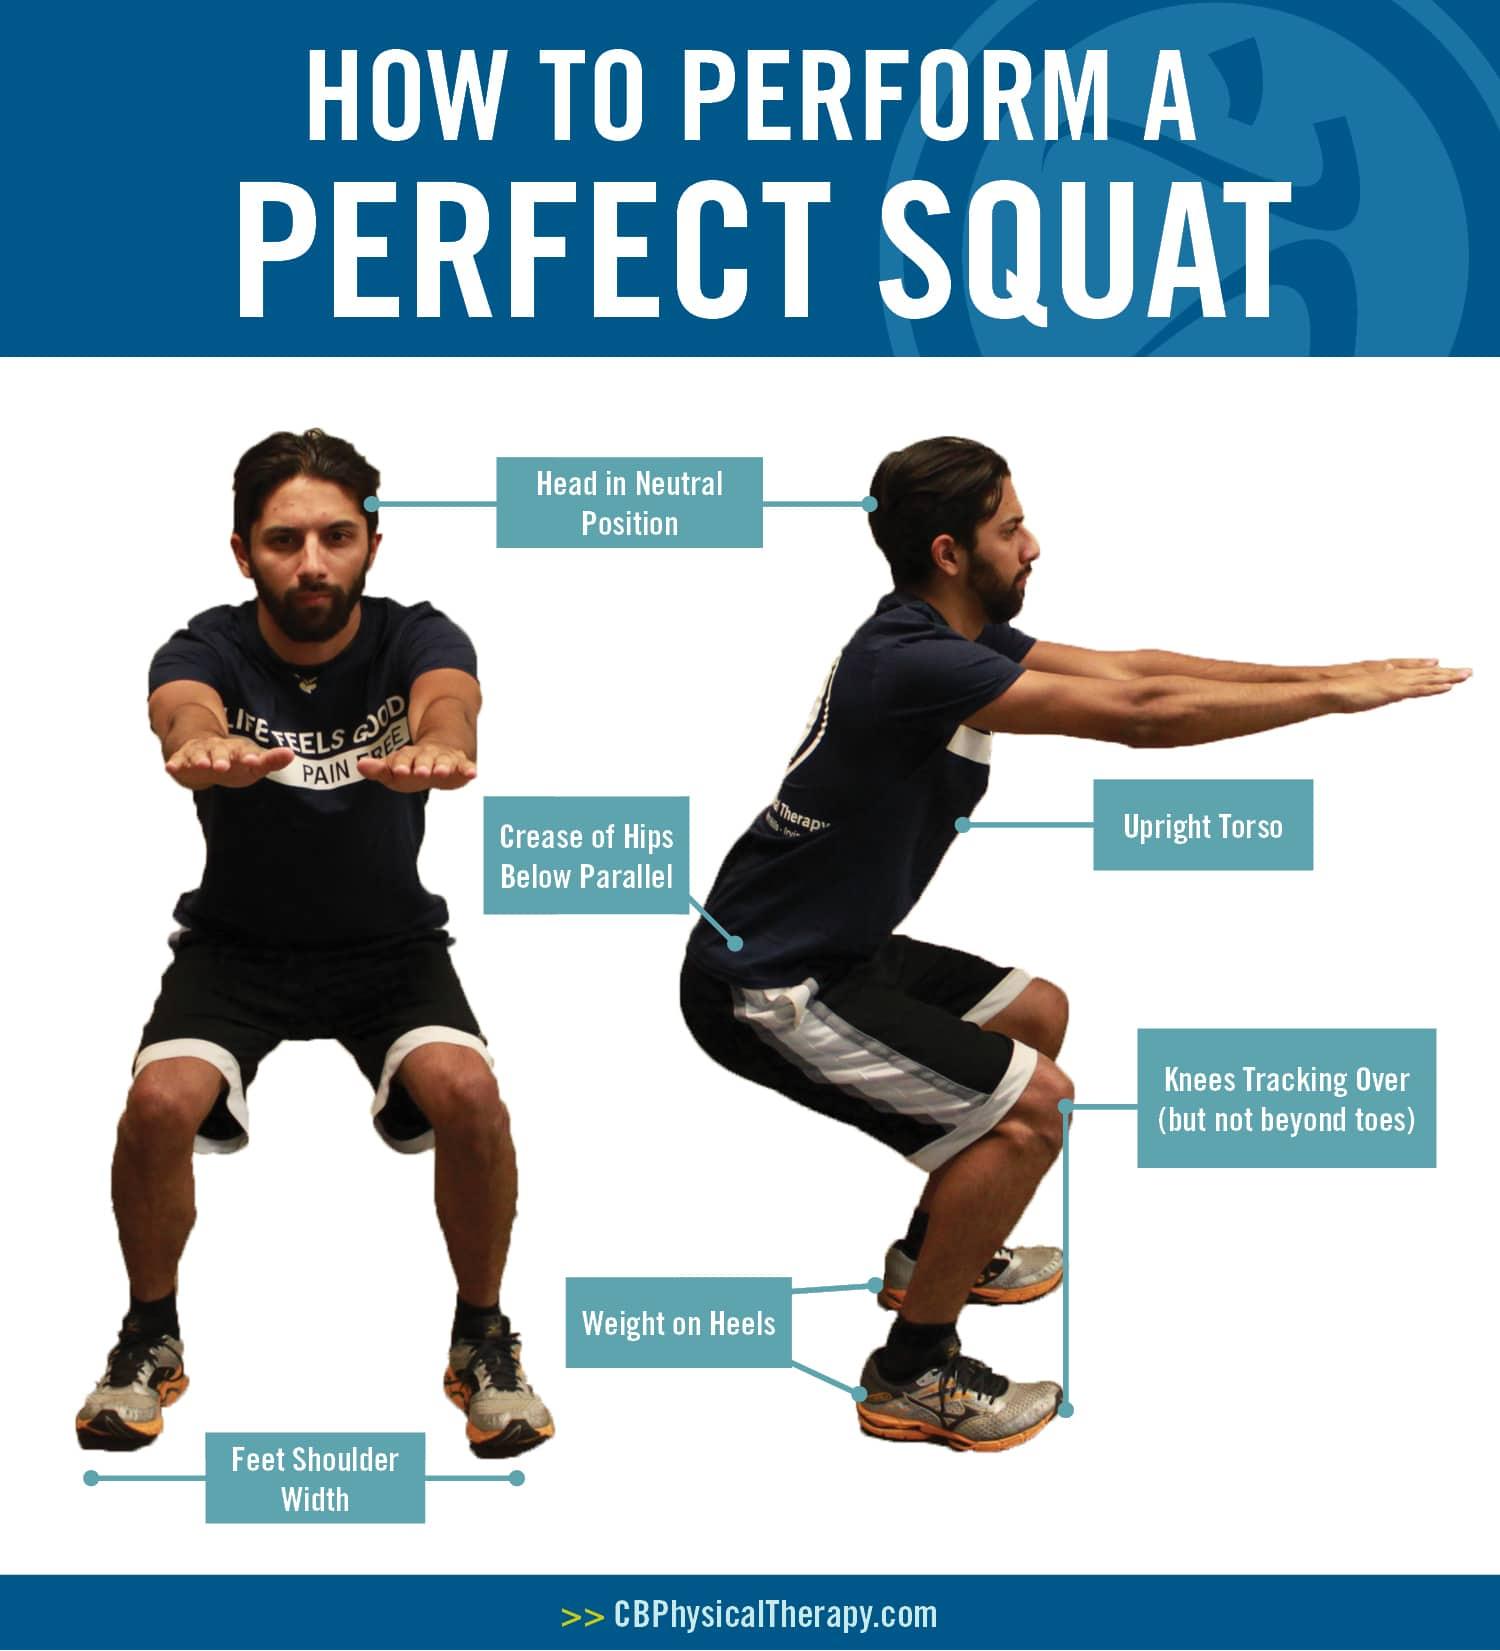 The Perfect Squat Diagram